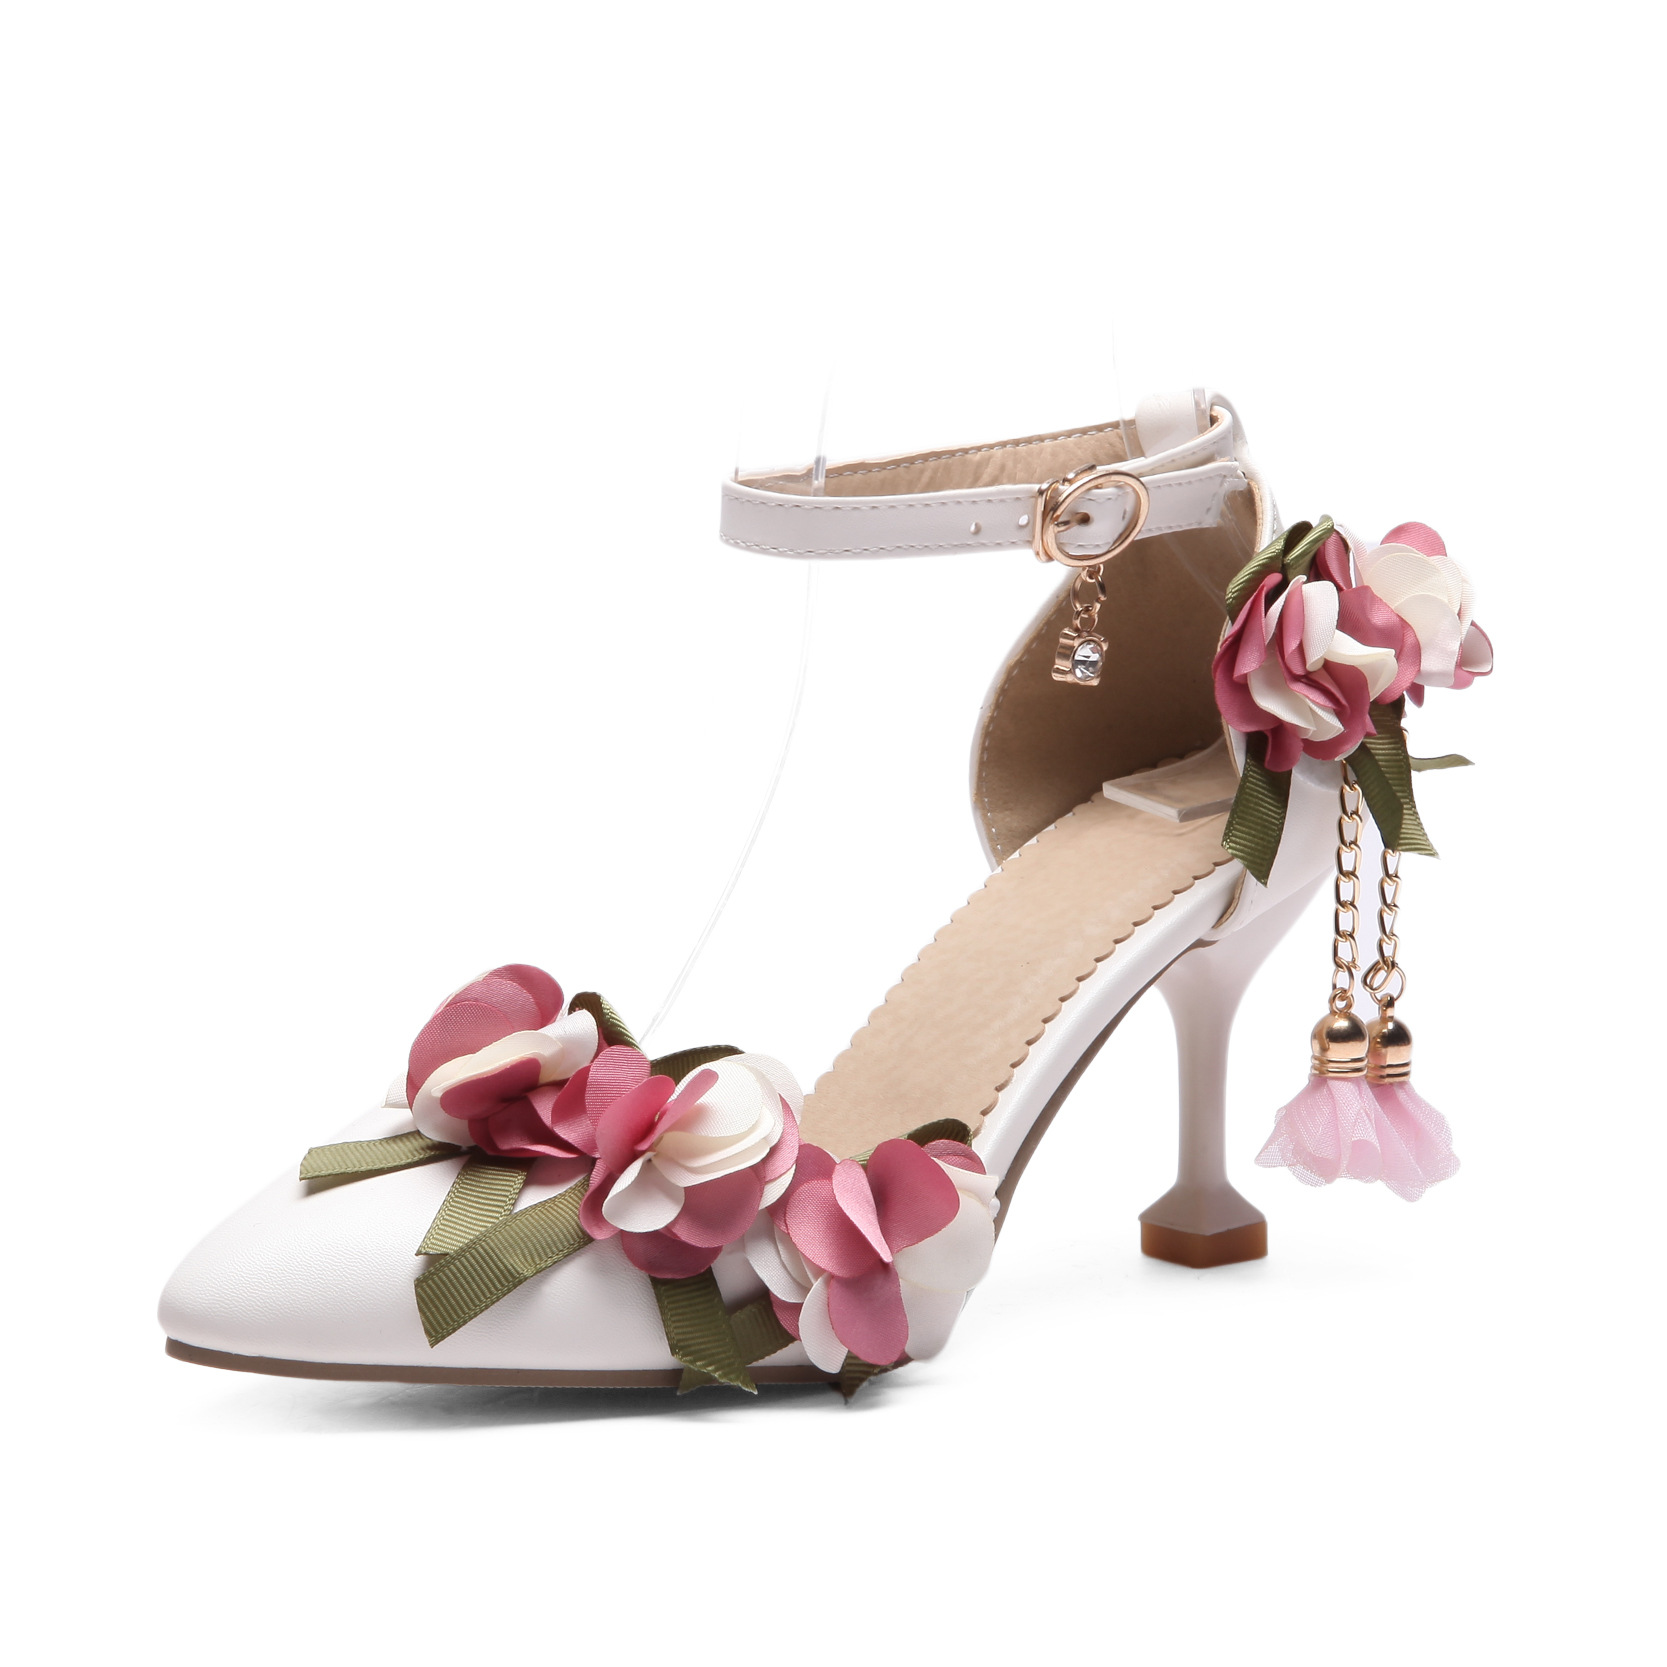 Women Sweet Party Pinkwhite Flower Wedding Pump Shoes 7cm Kitten